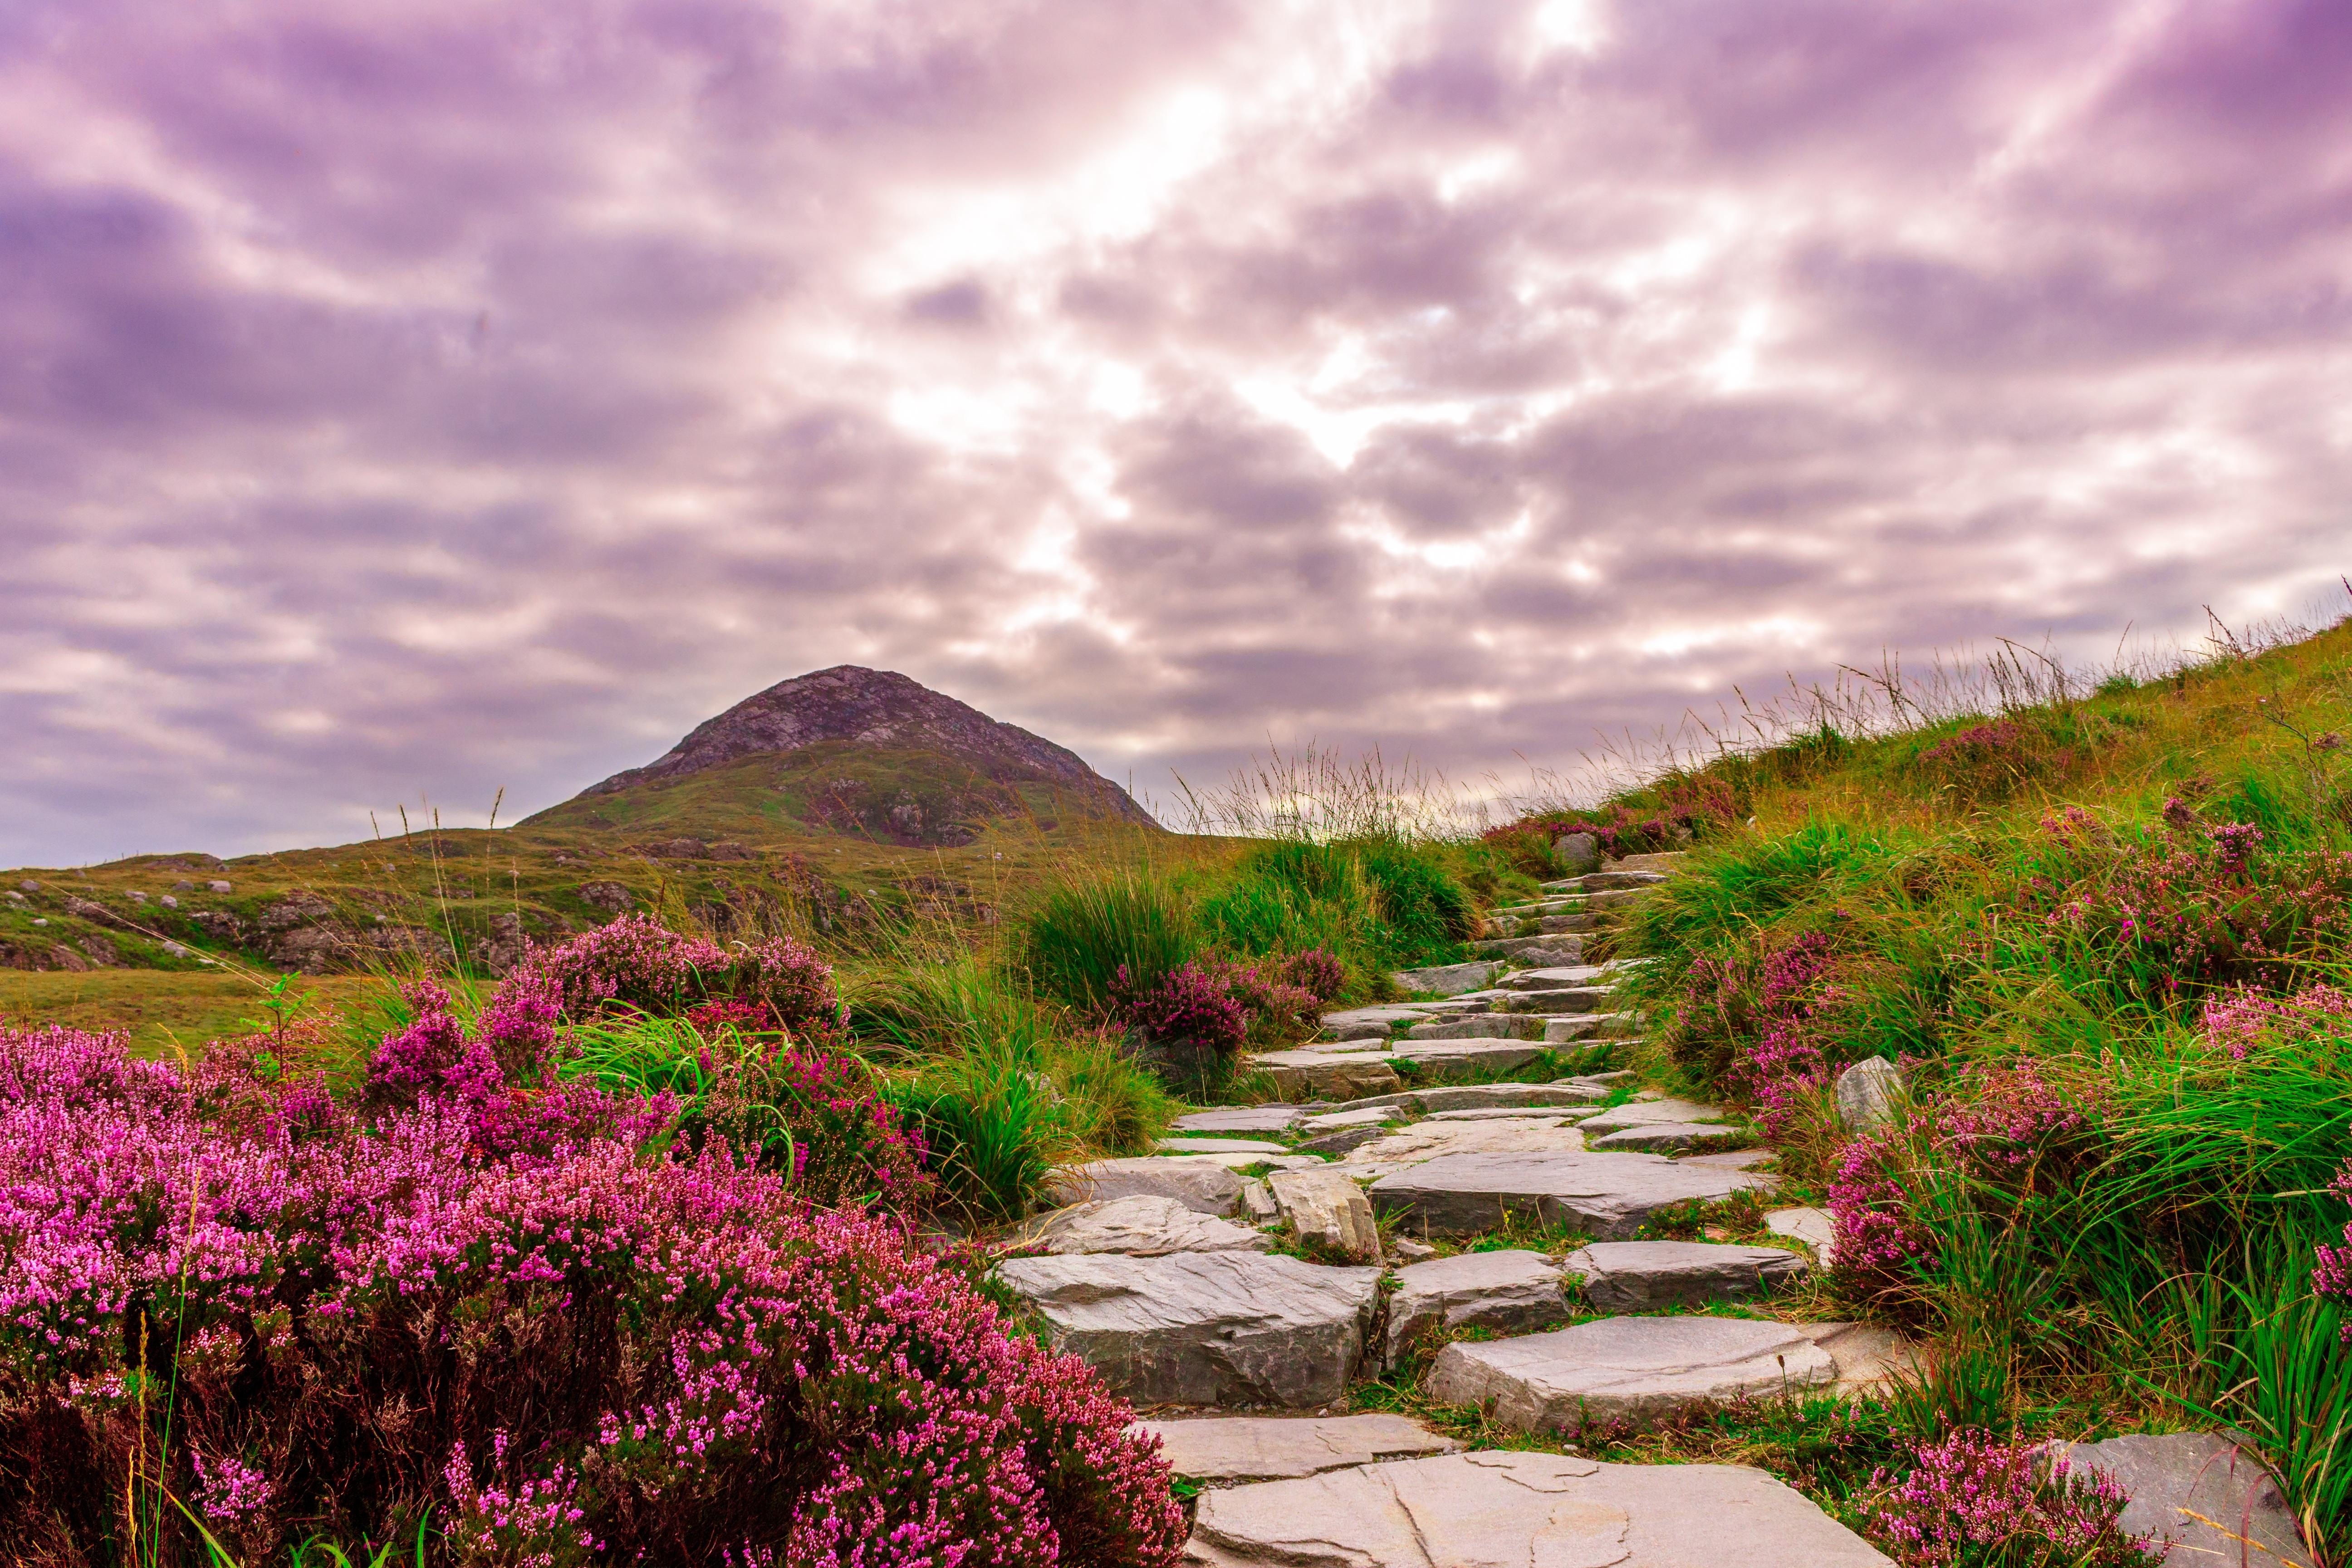 Free Images : landscape, coast, tree, nature, grass, wilderness ... for Flower Park Background  143gtk